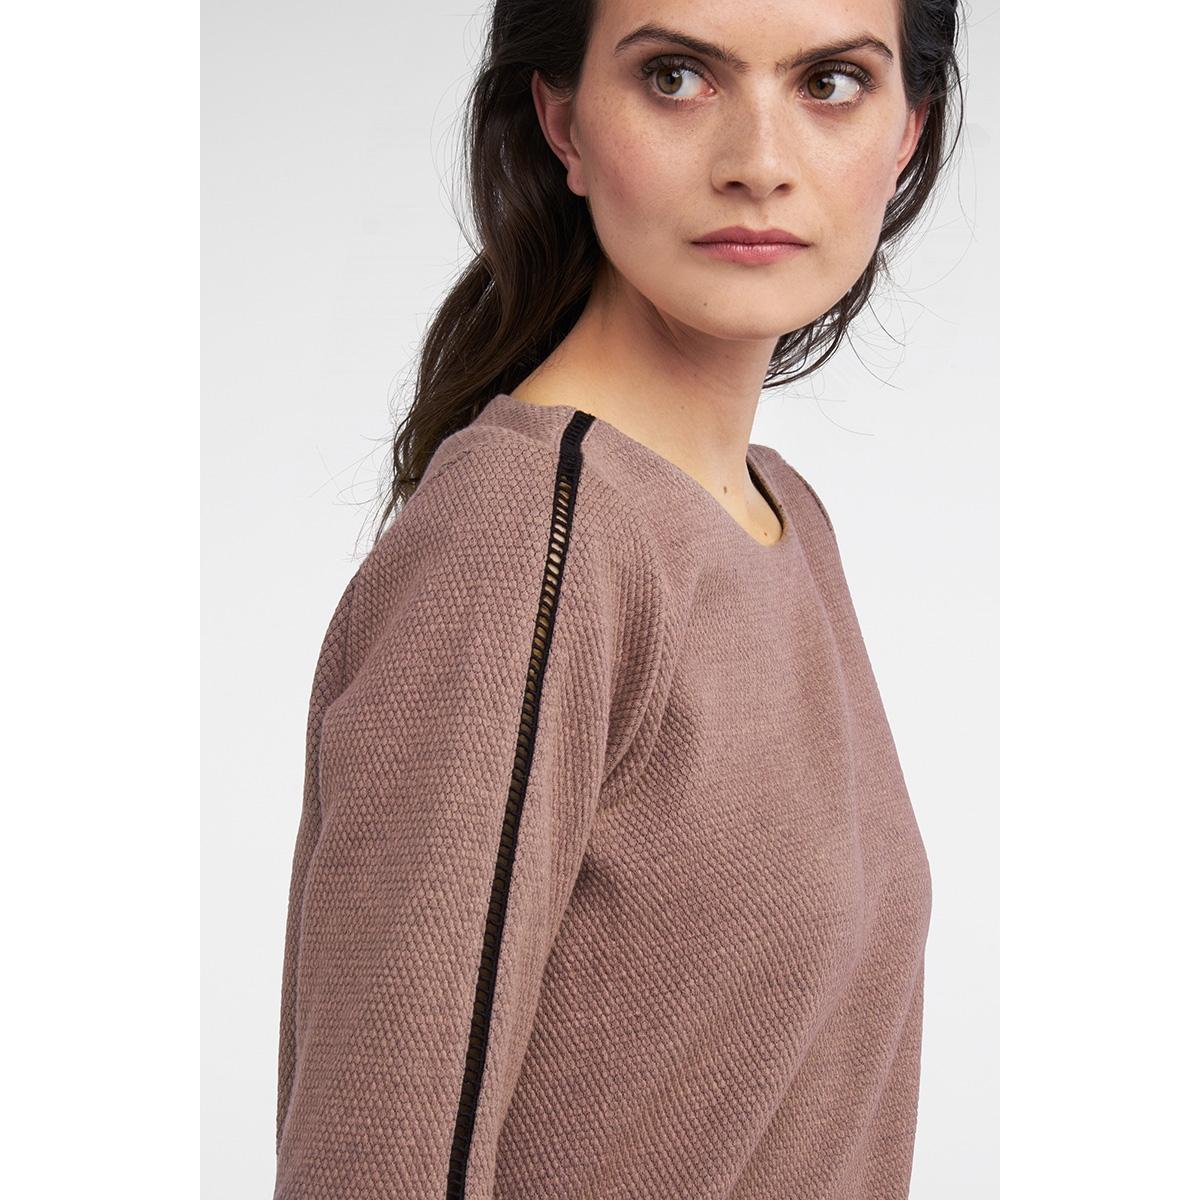 jacquard sweater met ajour detail 21201574 sandwich sweater 20123